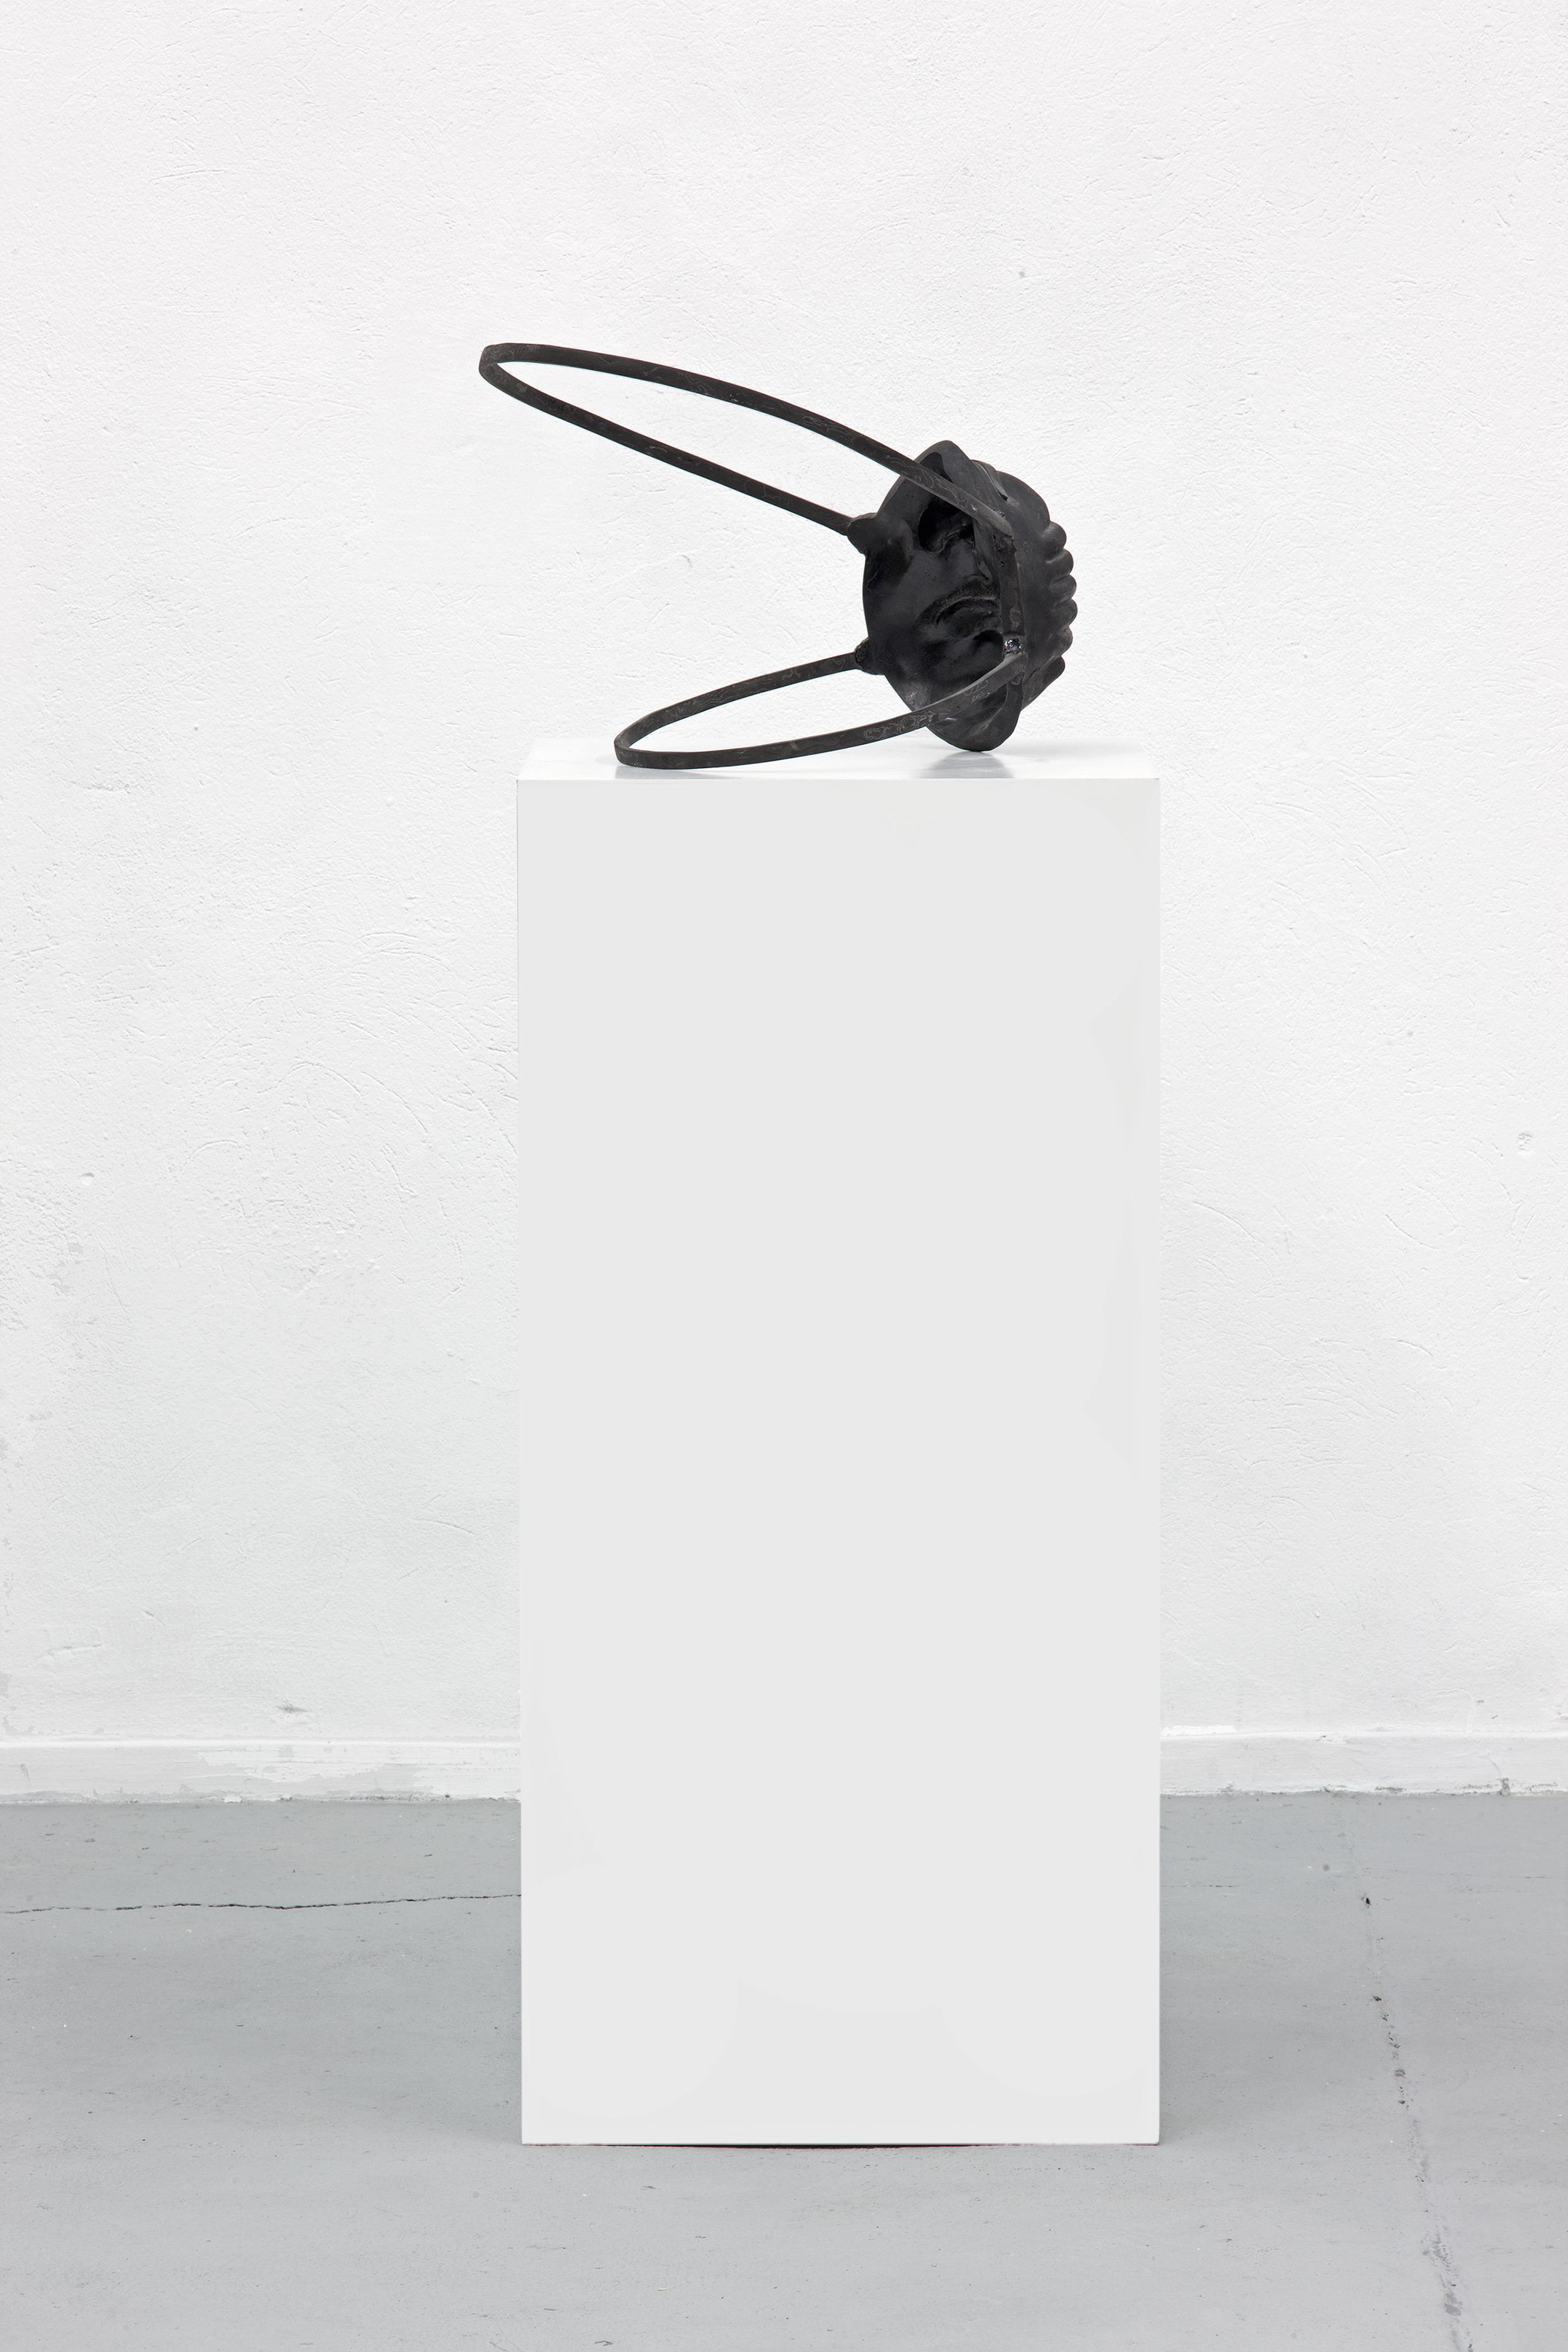 Maske / Selbstportrait, 2010 - black sculpture by Erik Andersen